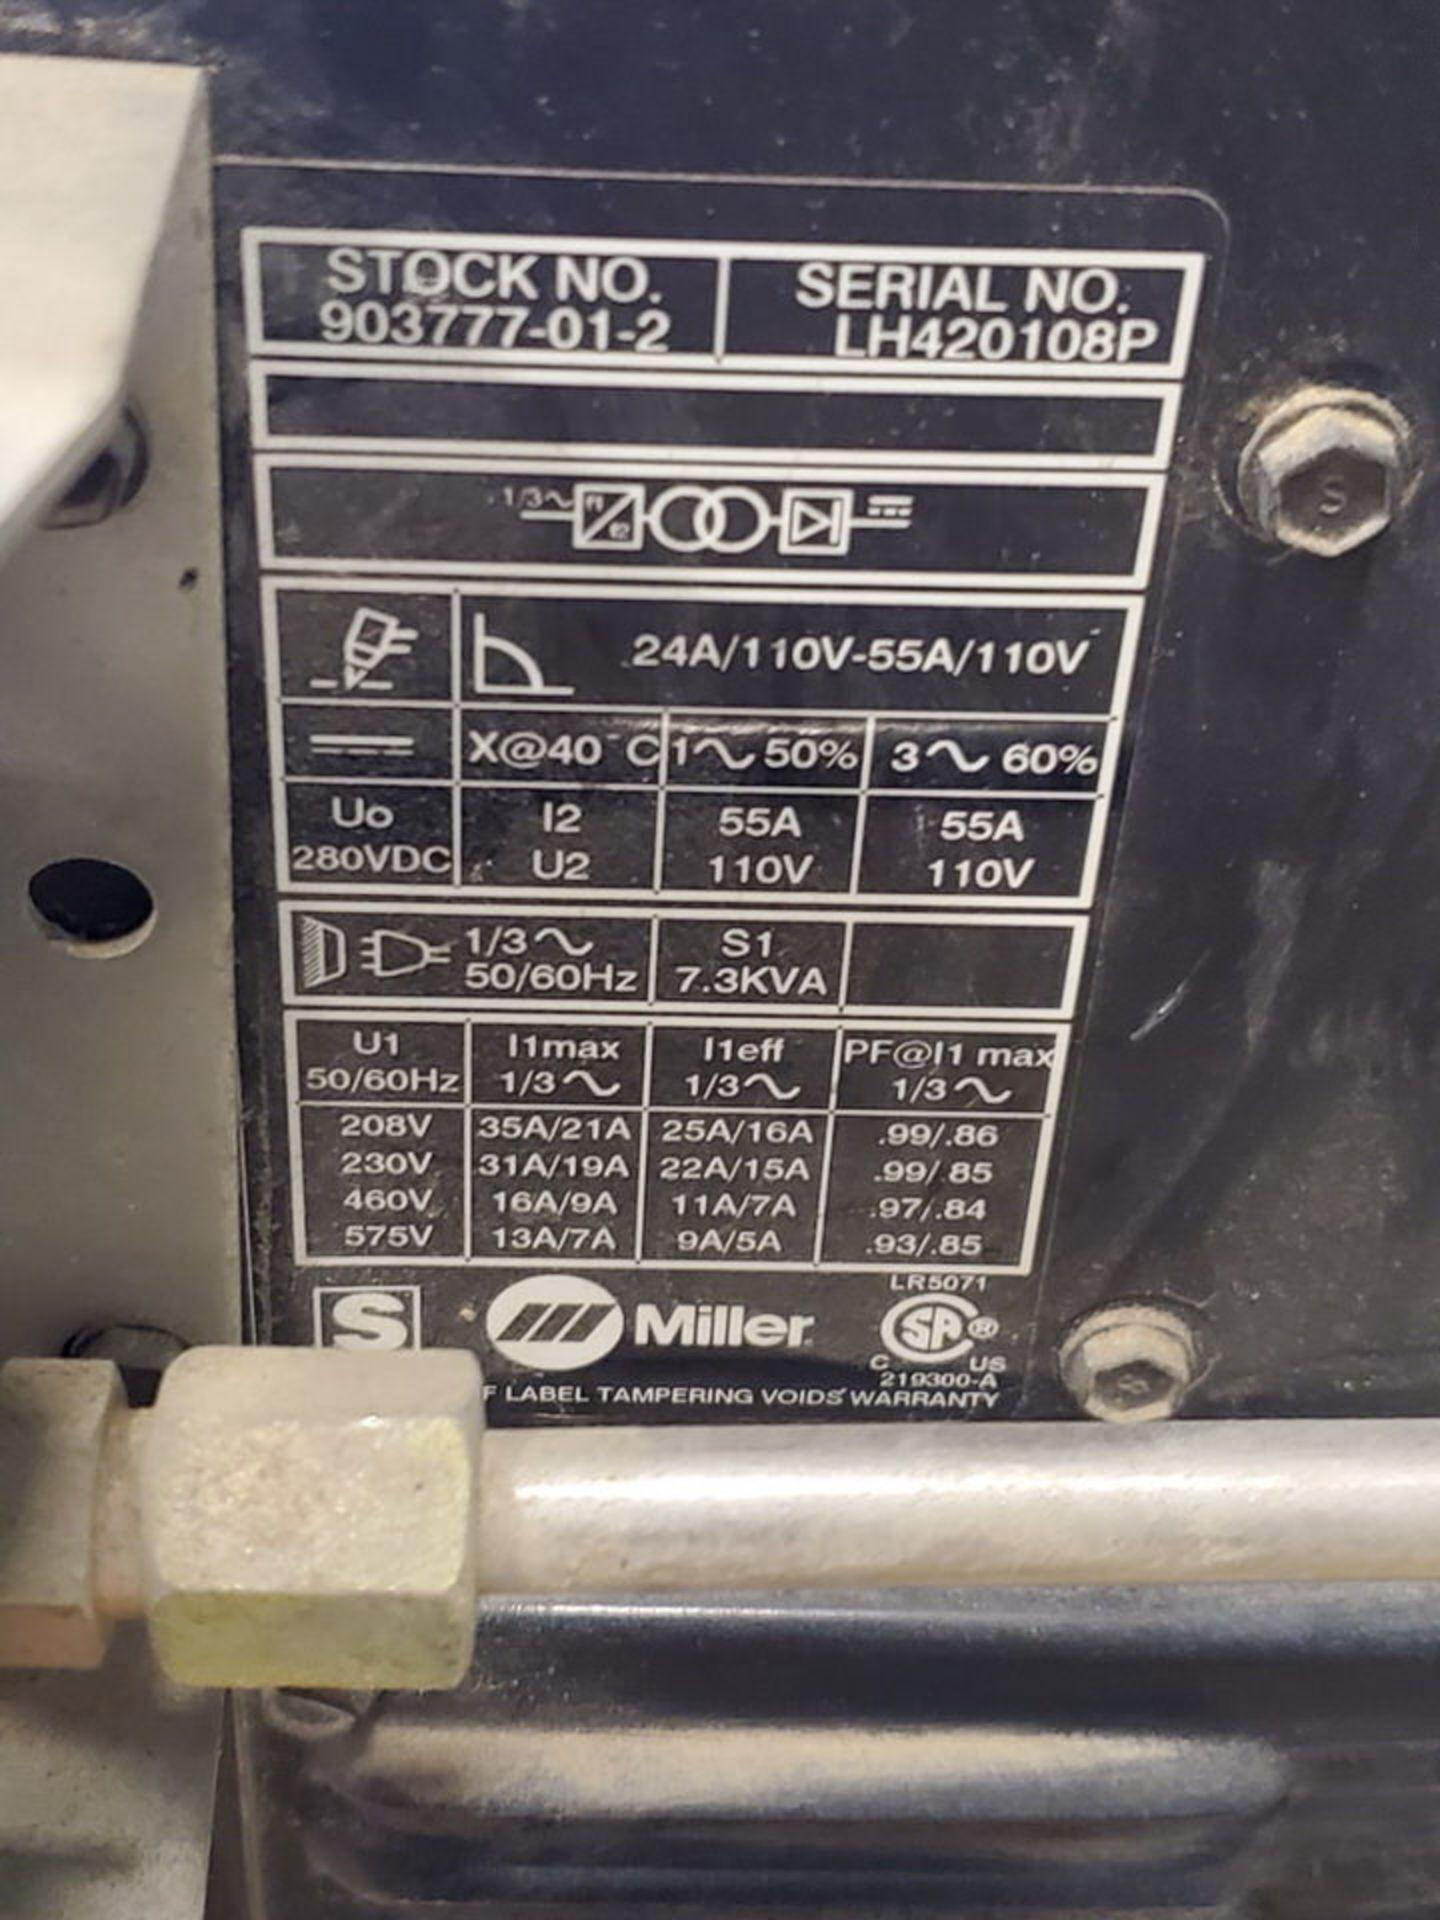 Miller Spectrum 2050 Plasma Cutter 208-575V, 50/60HZ, 3PH - Image 6 of 6